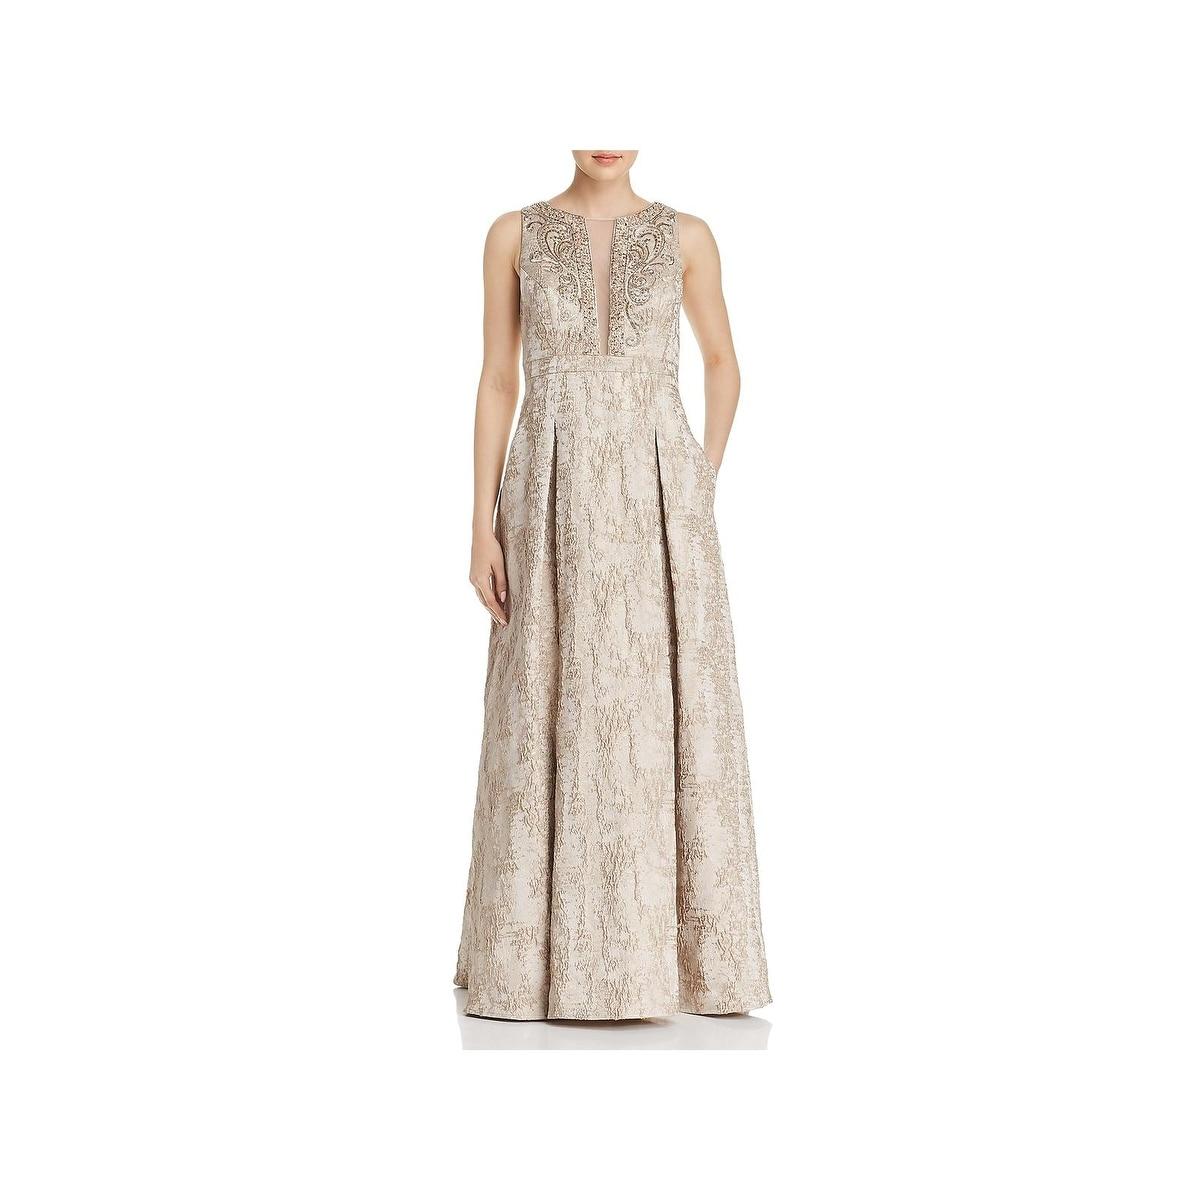 36680665bdb Eliza J Floral Jacquard Midi Skirt - Data Dynamic AG